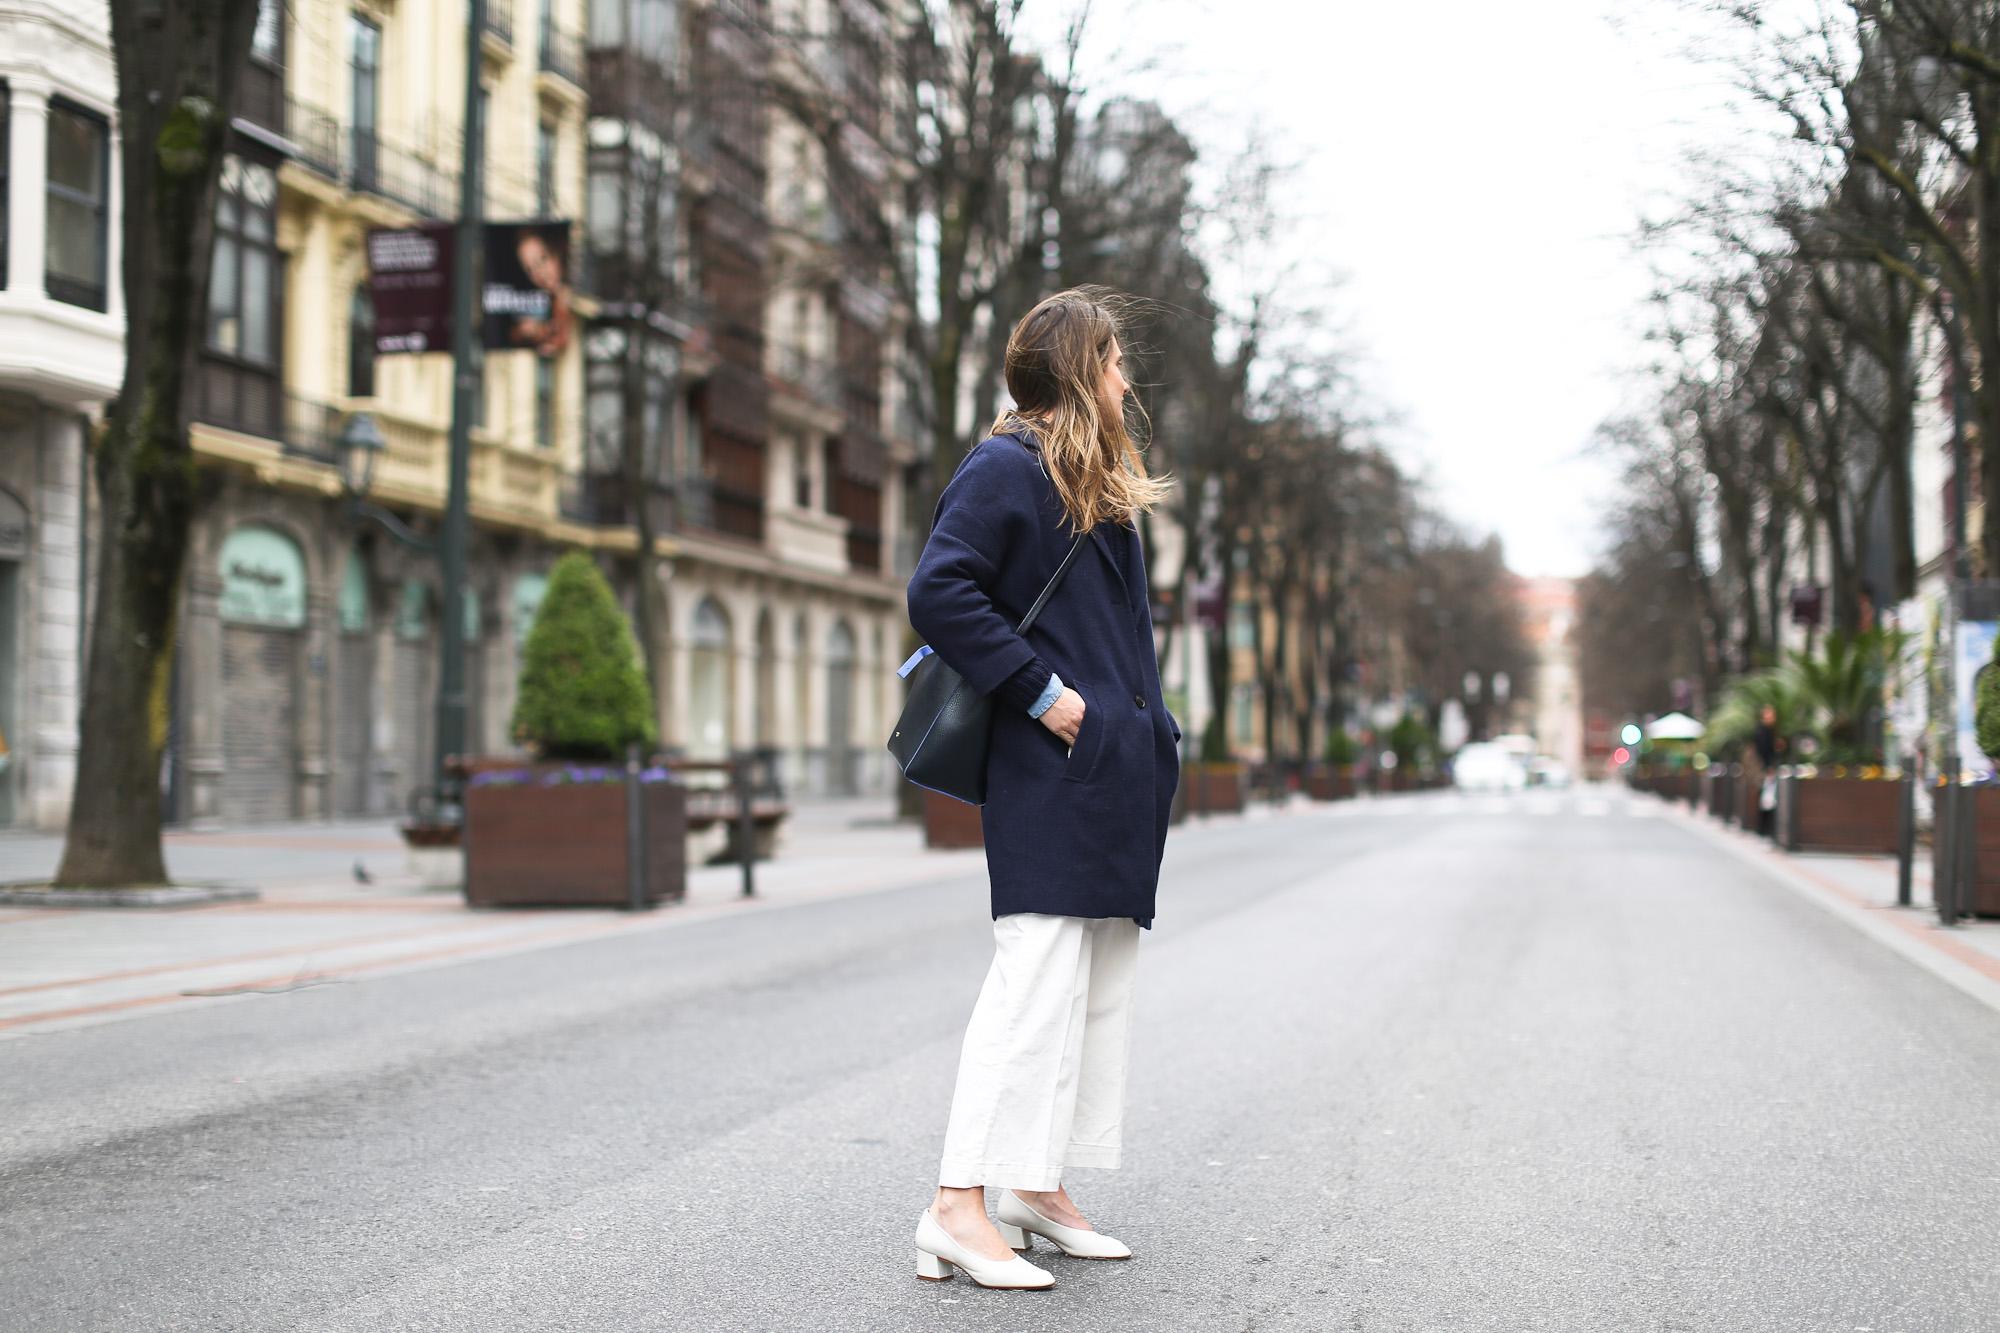 Clochet_streetstyle_masscob_coulson_coat_trimmerbilbao_granny_shoes_white_culottes-8